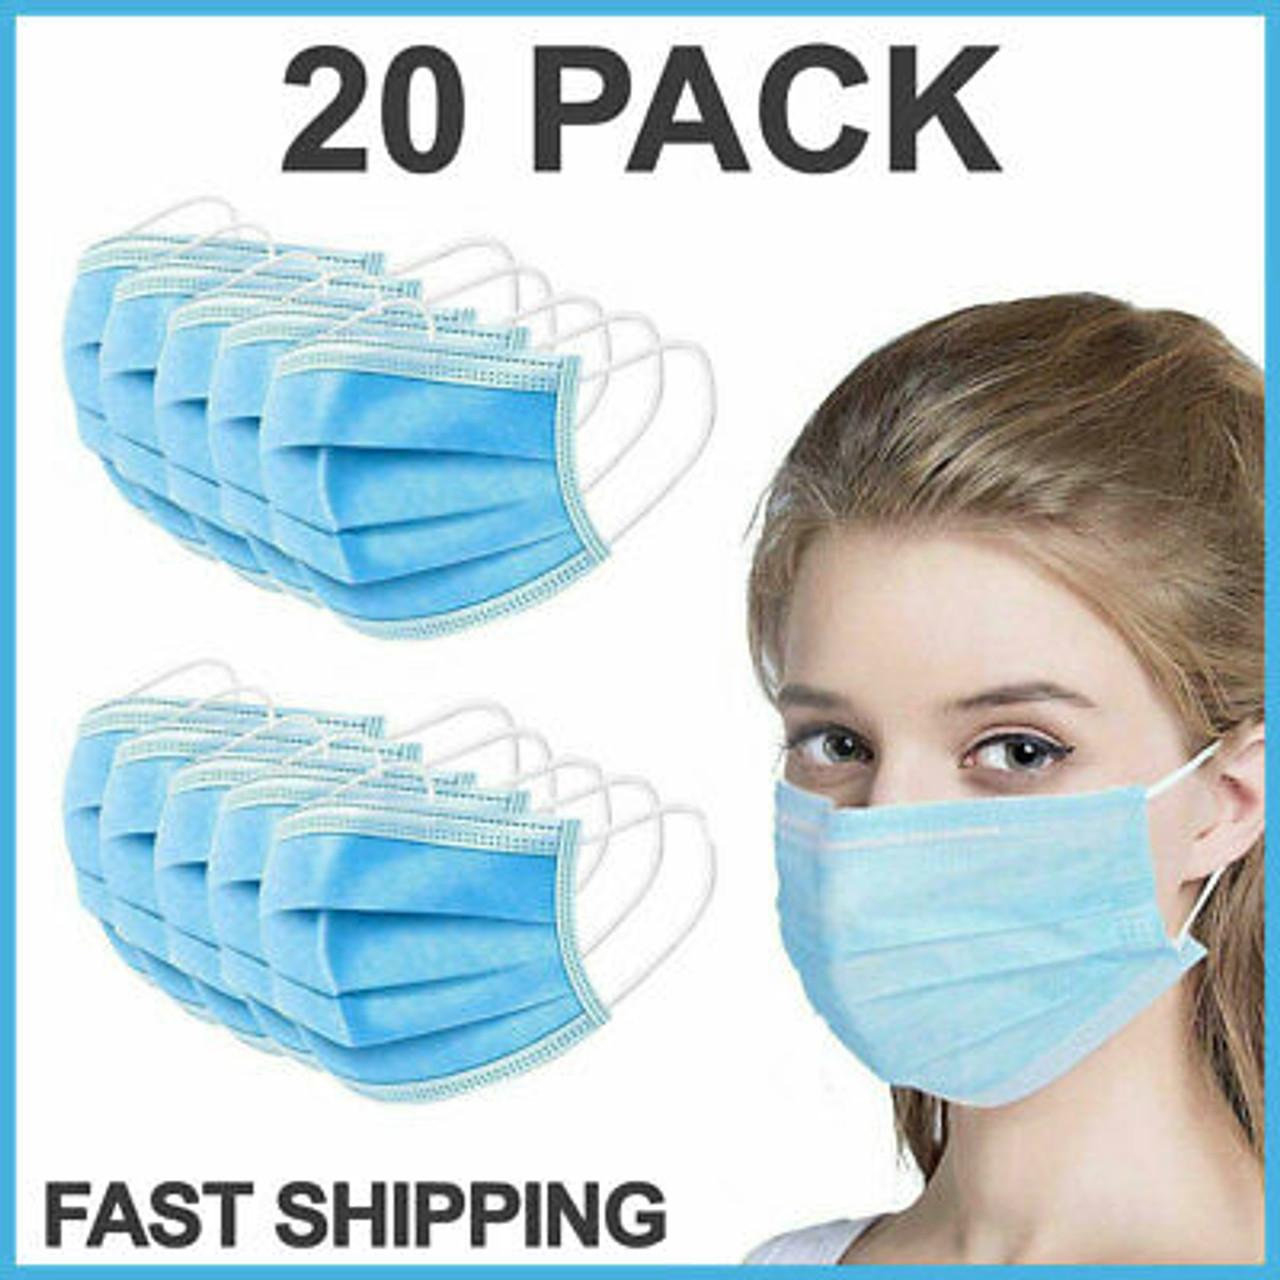 Disposable Medical Masks (Non-Sterile) - 20 pcs (20200501)